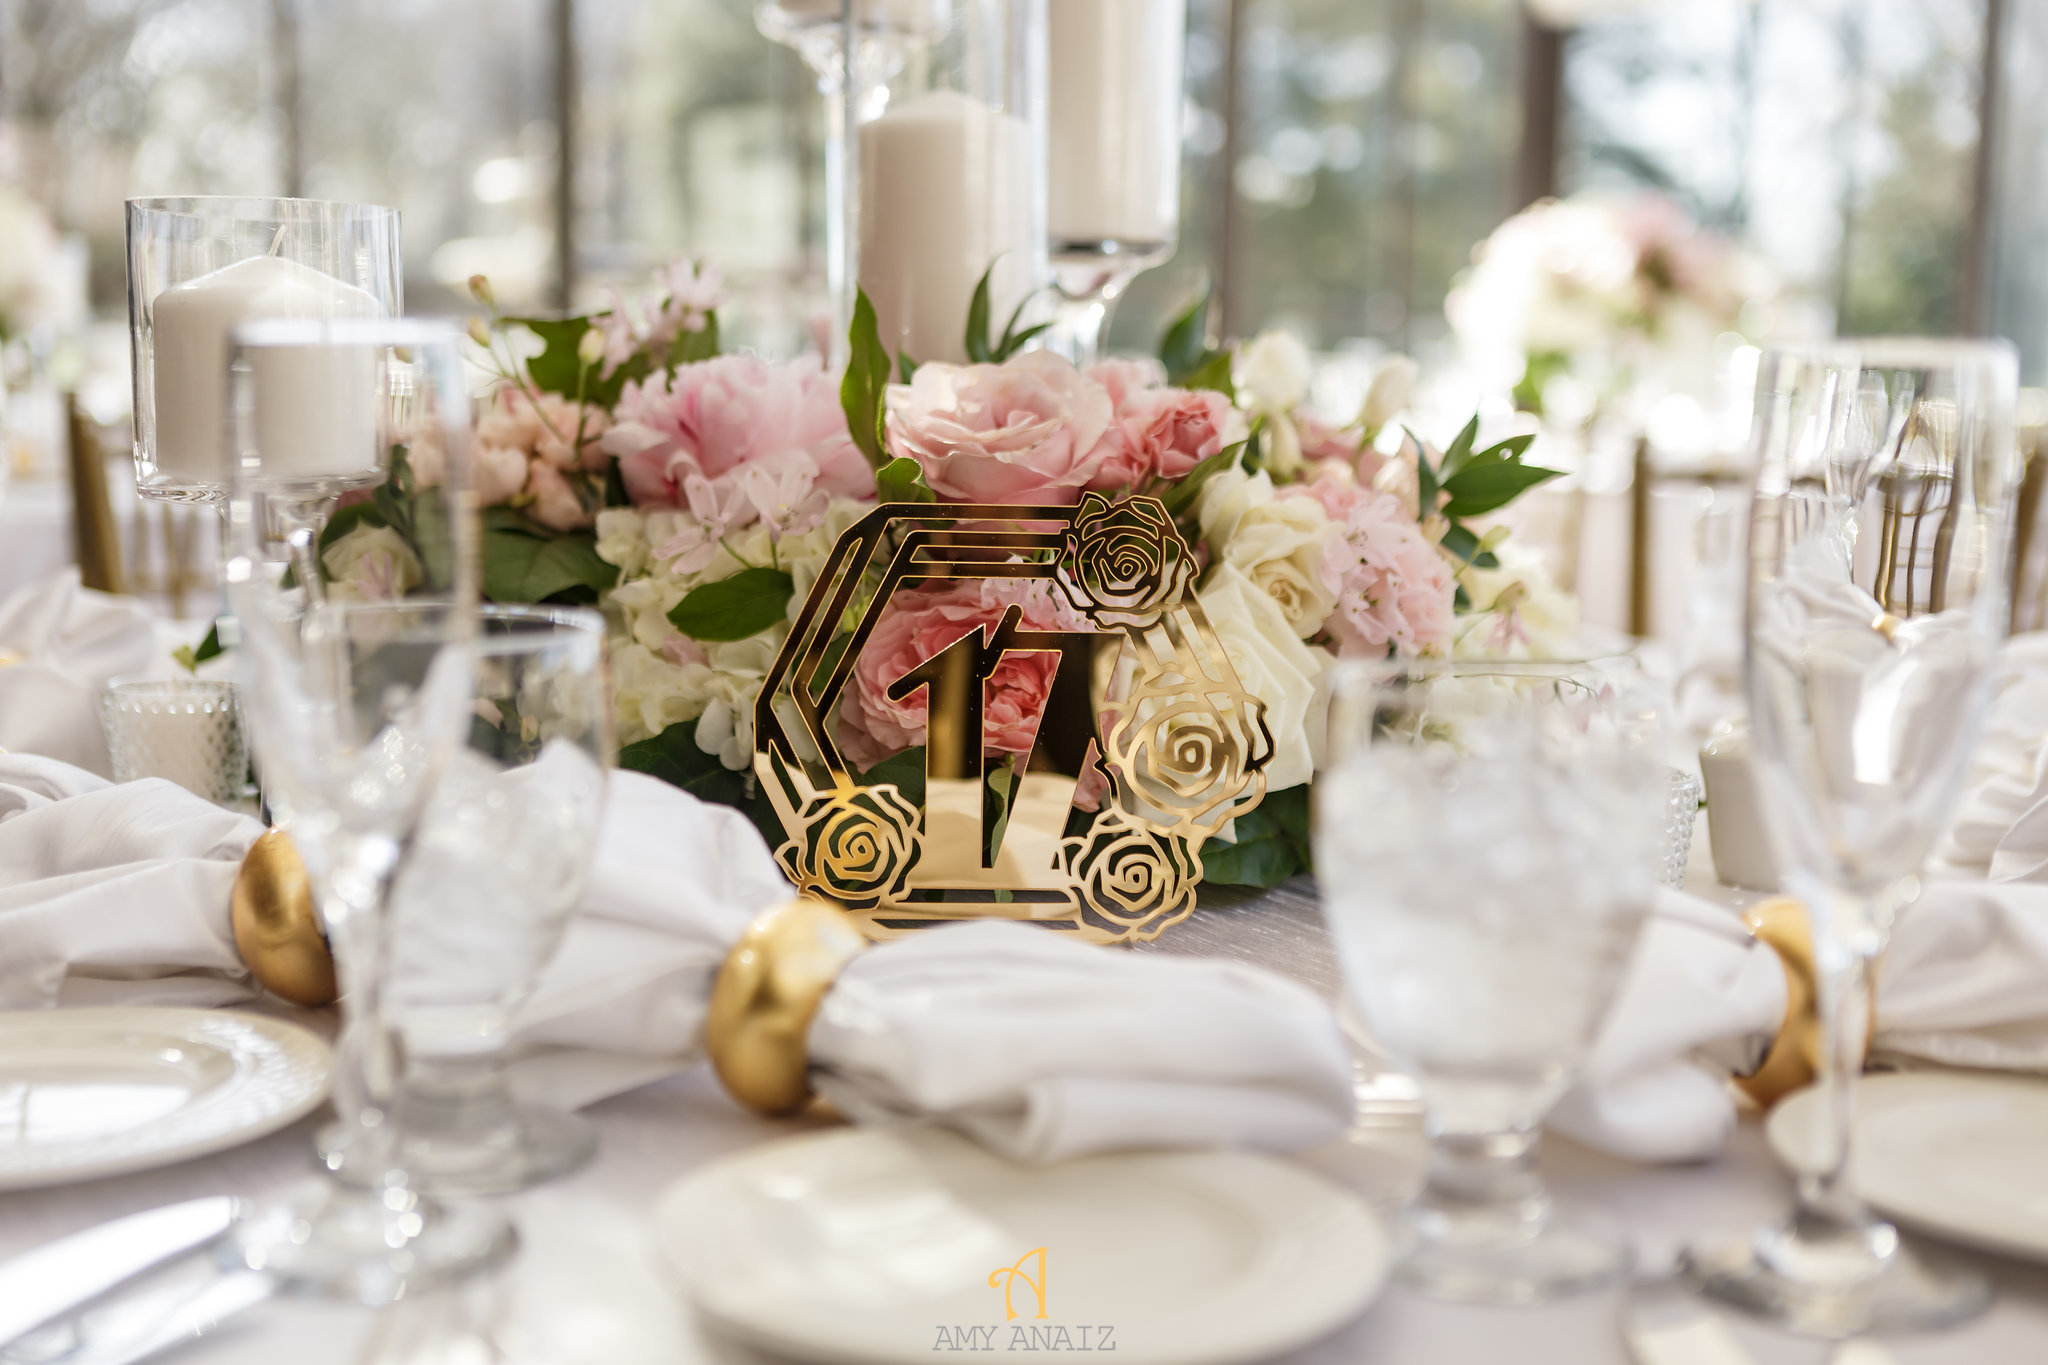 NYIT de Serversky Mansion, Long Island Wedding Venue, Wedding Reception, Blush and Gold Wedding.JPG